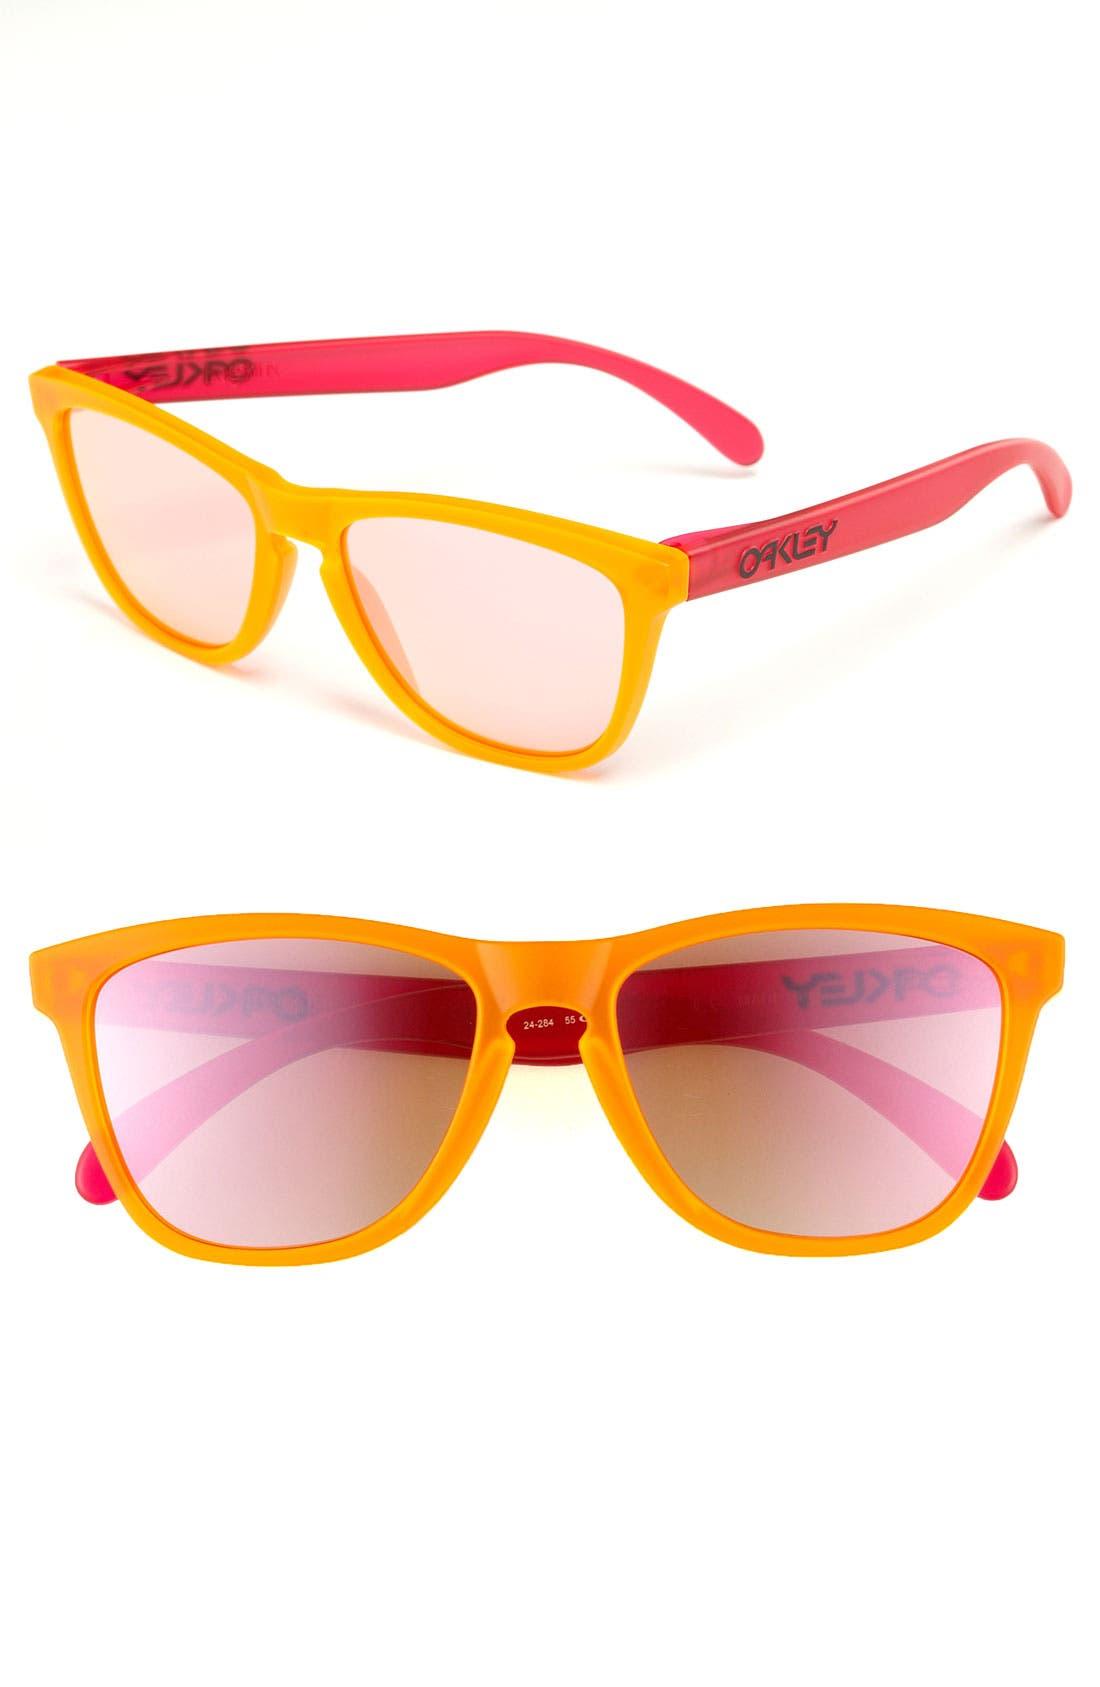 Alternate Image 1 Selected - Oakley 'Frogskins® - Blacklight Edition' 57mm Sunglasses